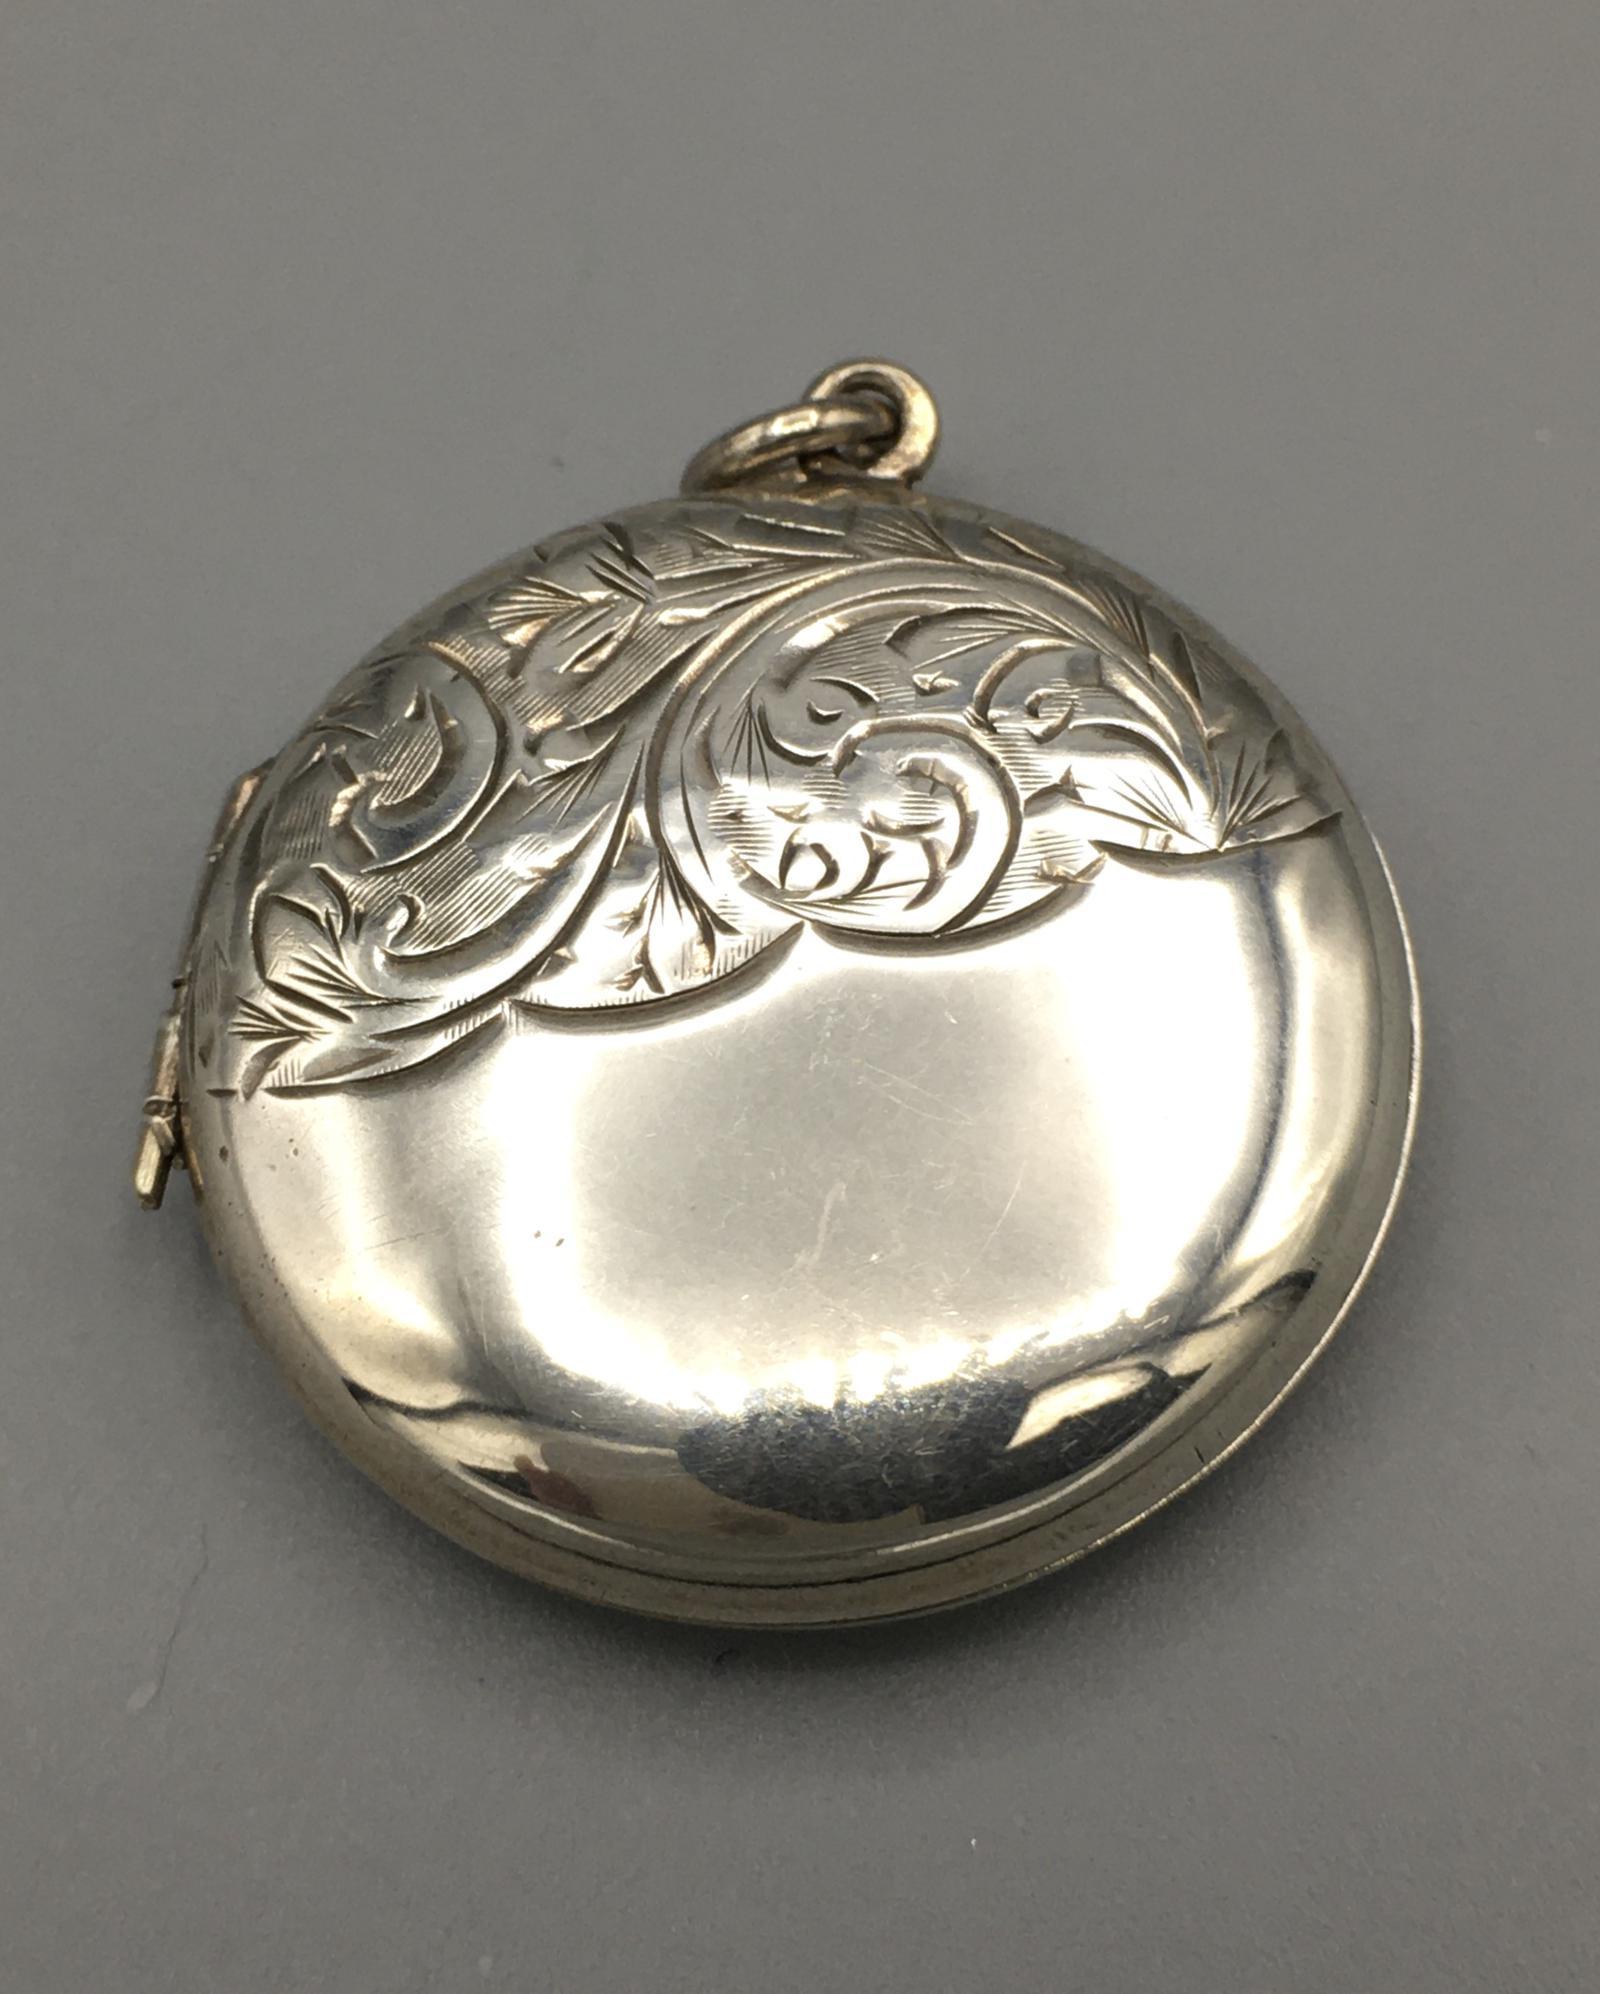 Teresa Brill Jewellery Ltd image (2 of 4)